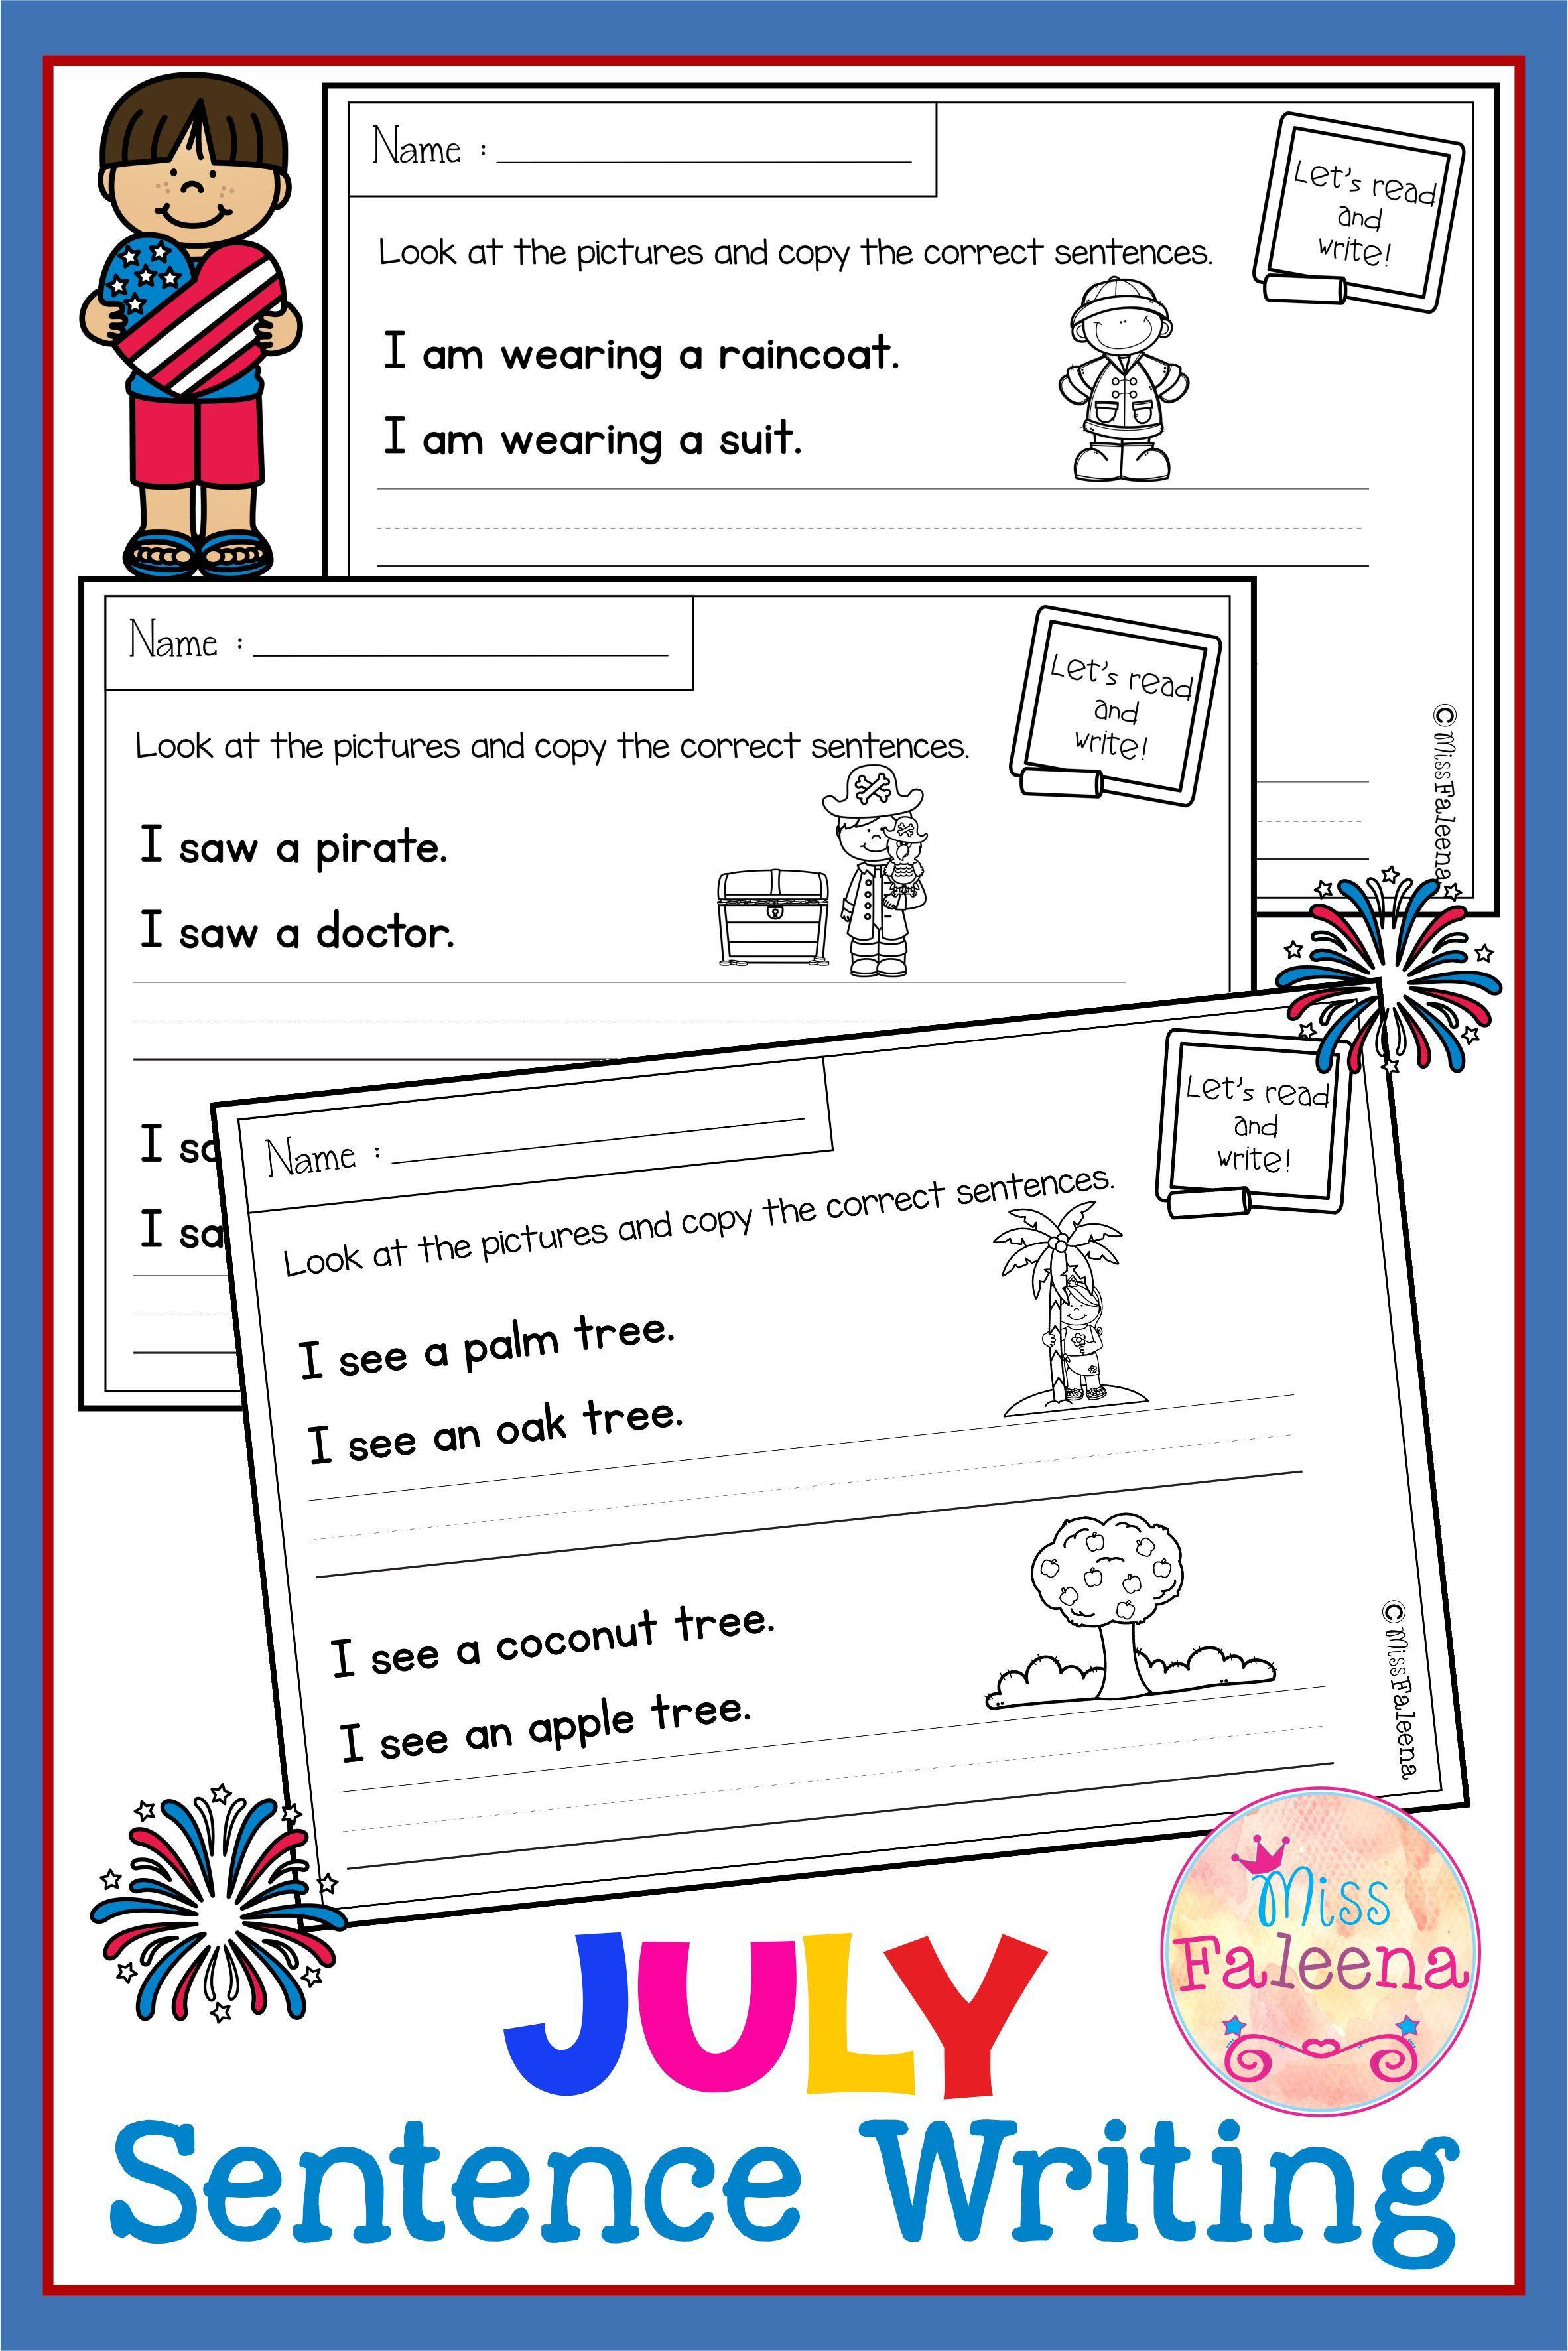 July Sentence Writing In